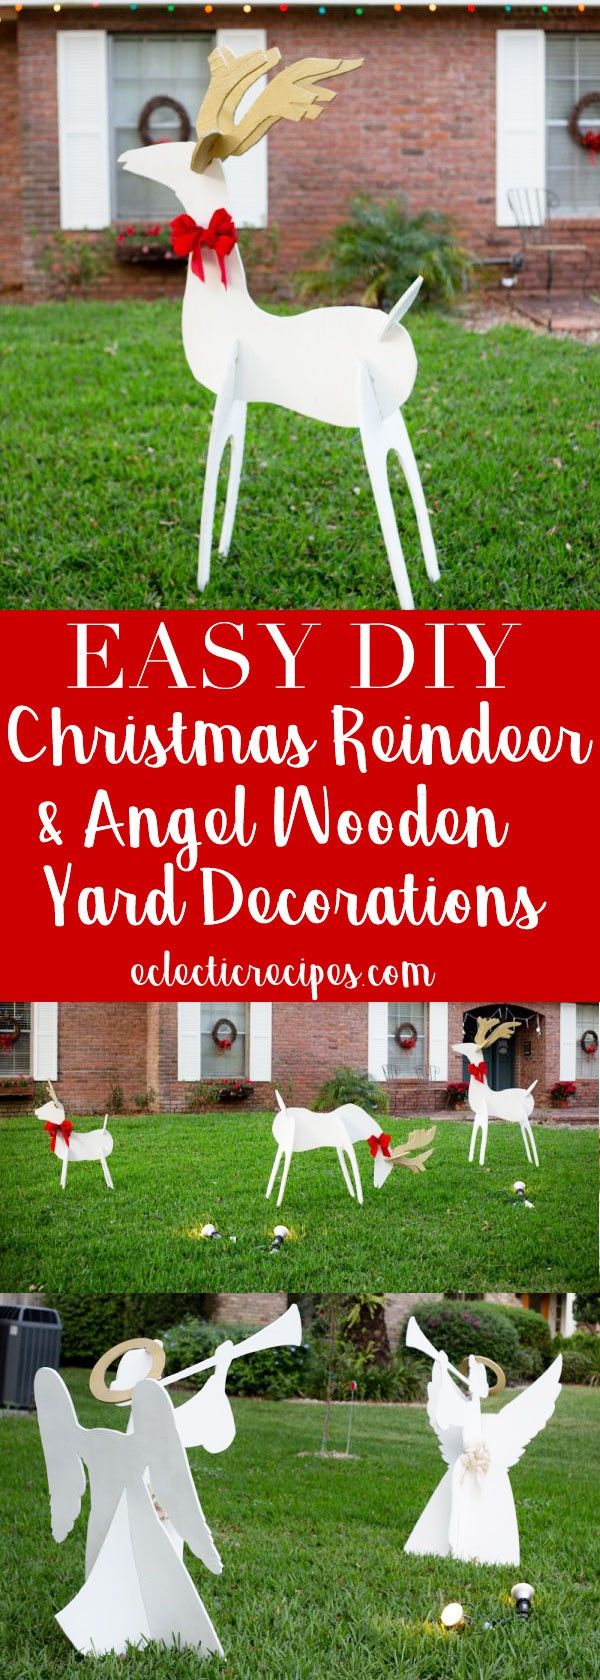 Christmas Reindeer and Angel Wooden Yard Decorations DIY